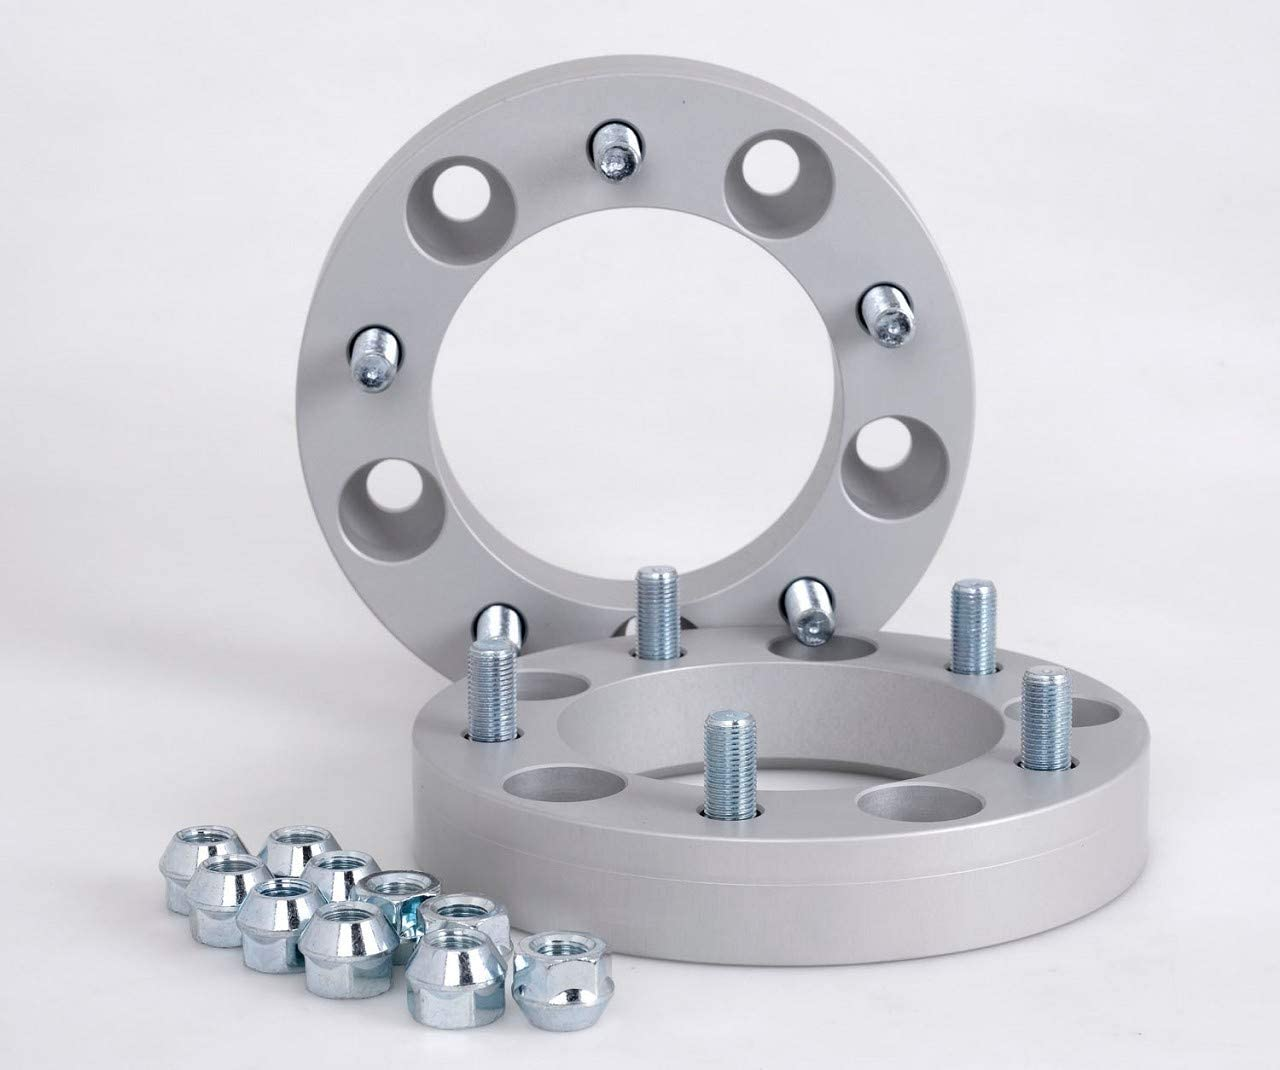 Spurverbreiterung Aluminium 2 Stück 30 Mm Pro Scheibe 60 Mm Pro Achse Inkl TÜv Teilegutachten Auto